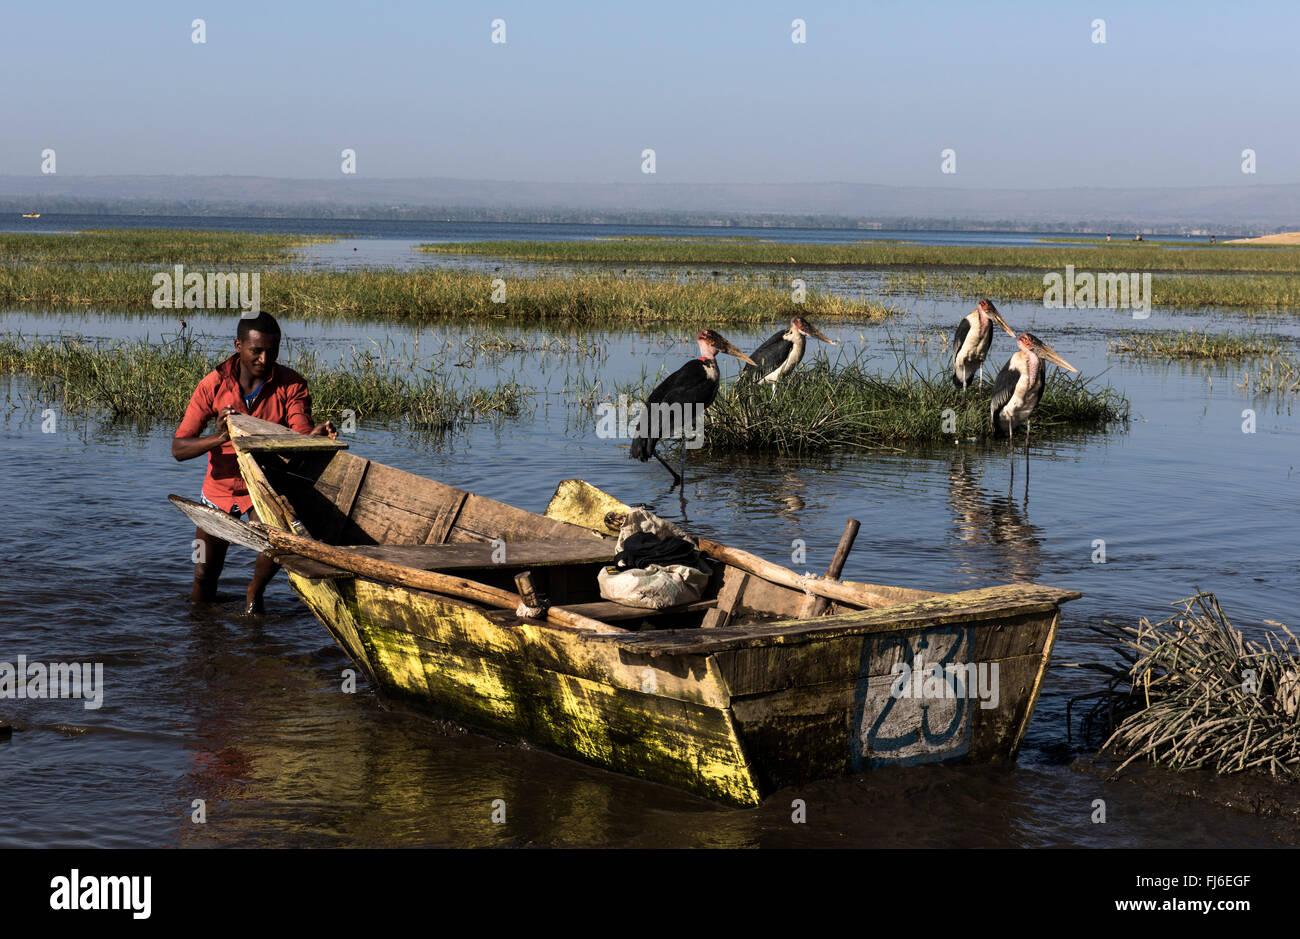 Local people fishing Awasa Lake, Ethiopia, Africa - Stock Image